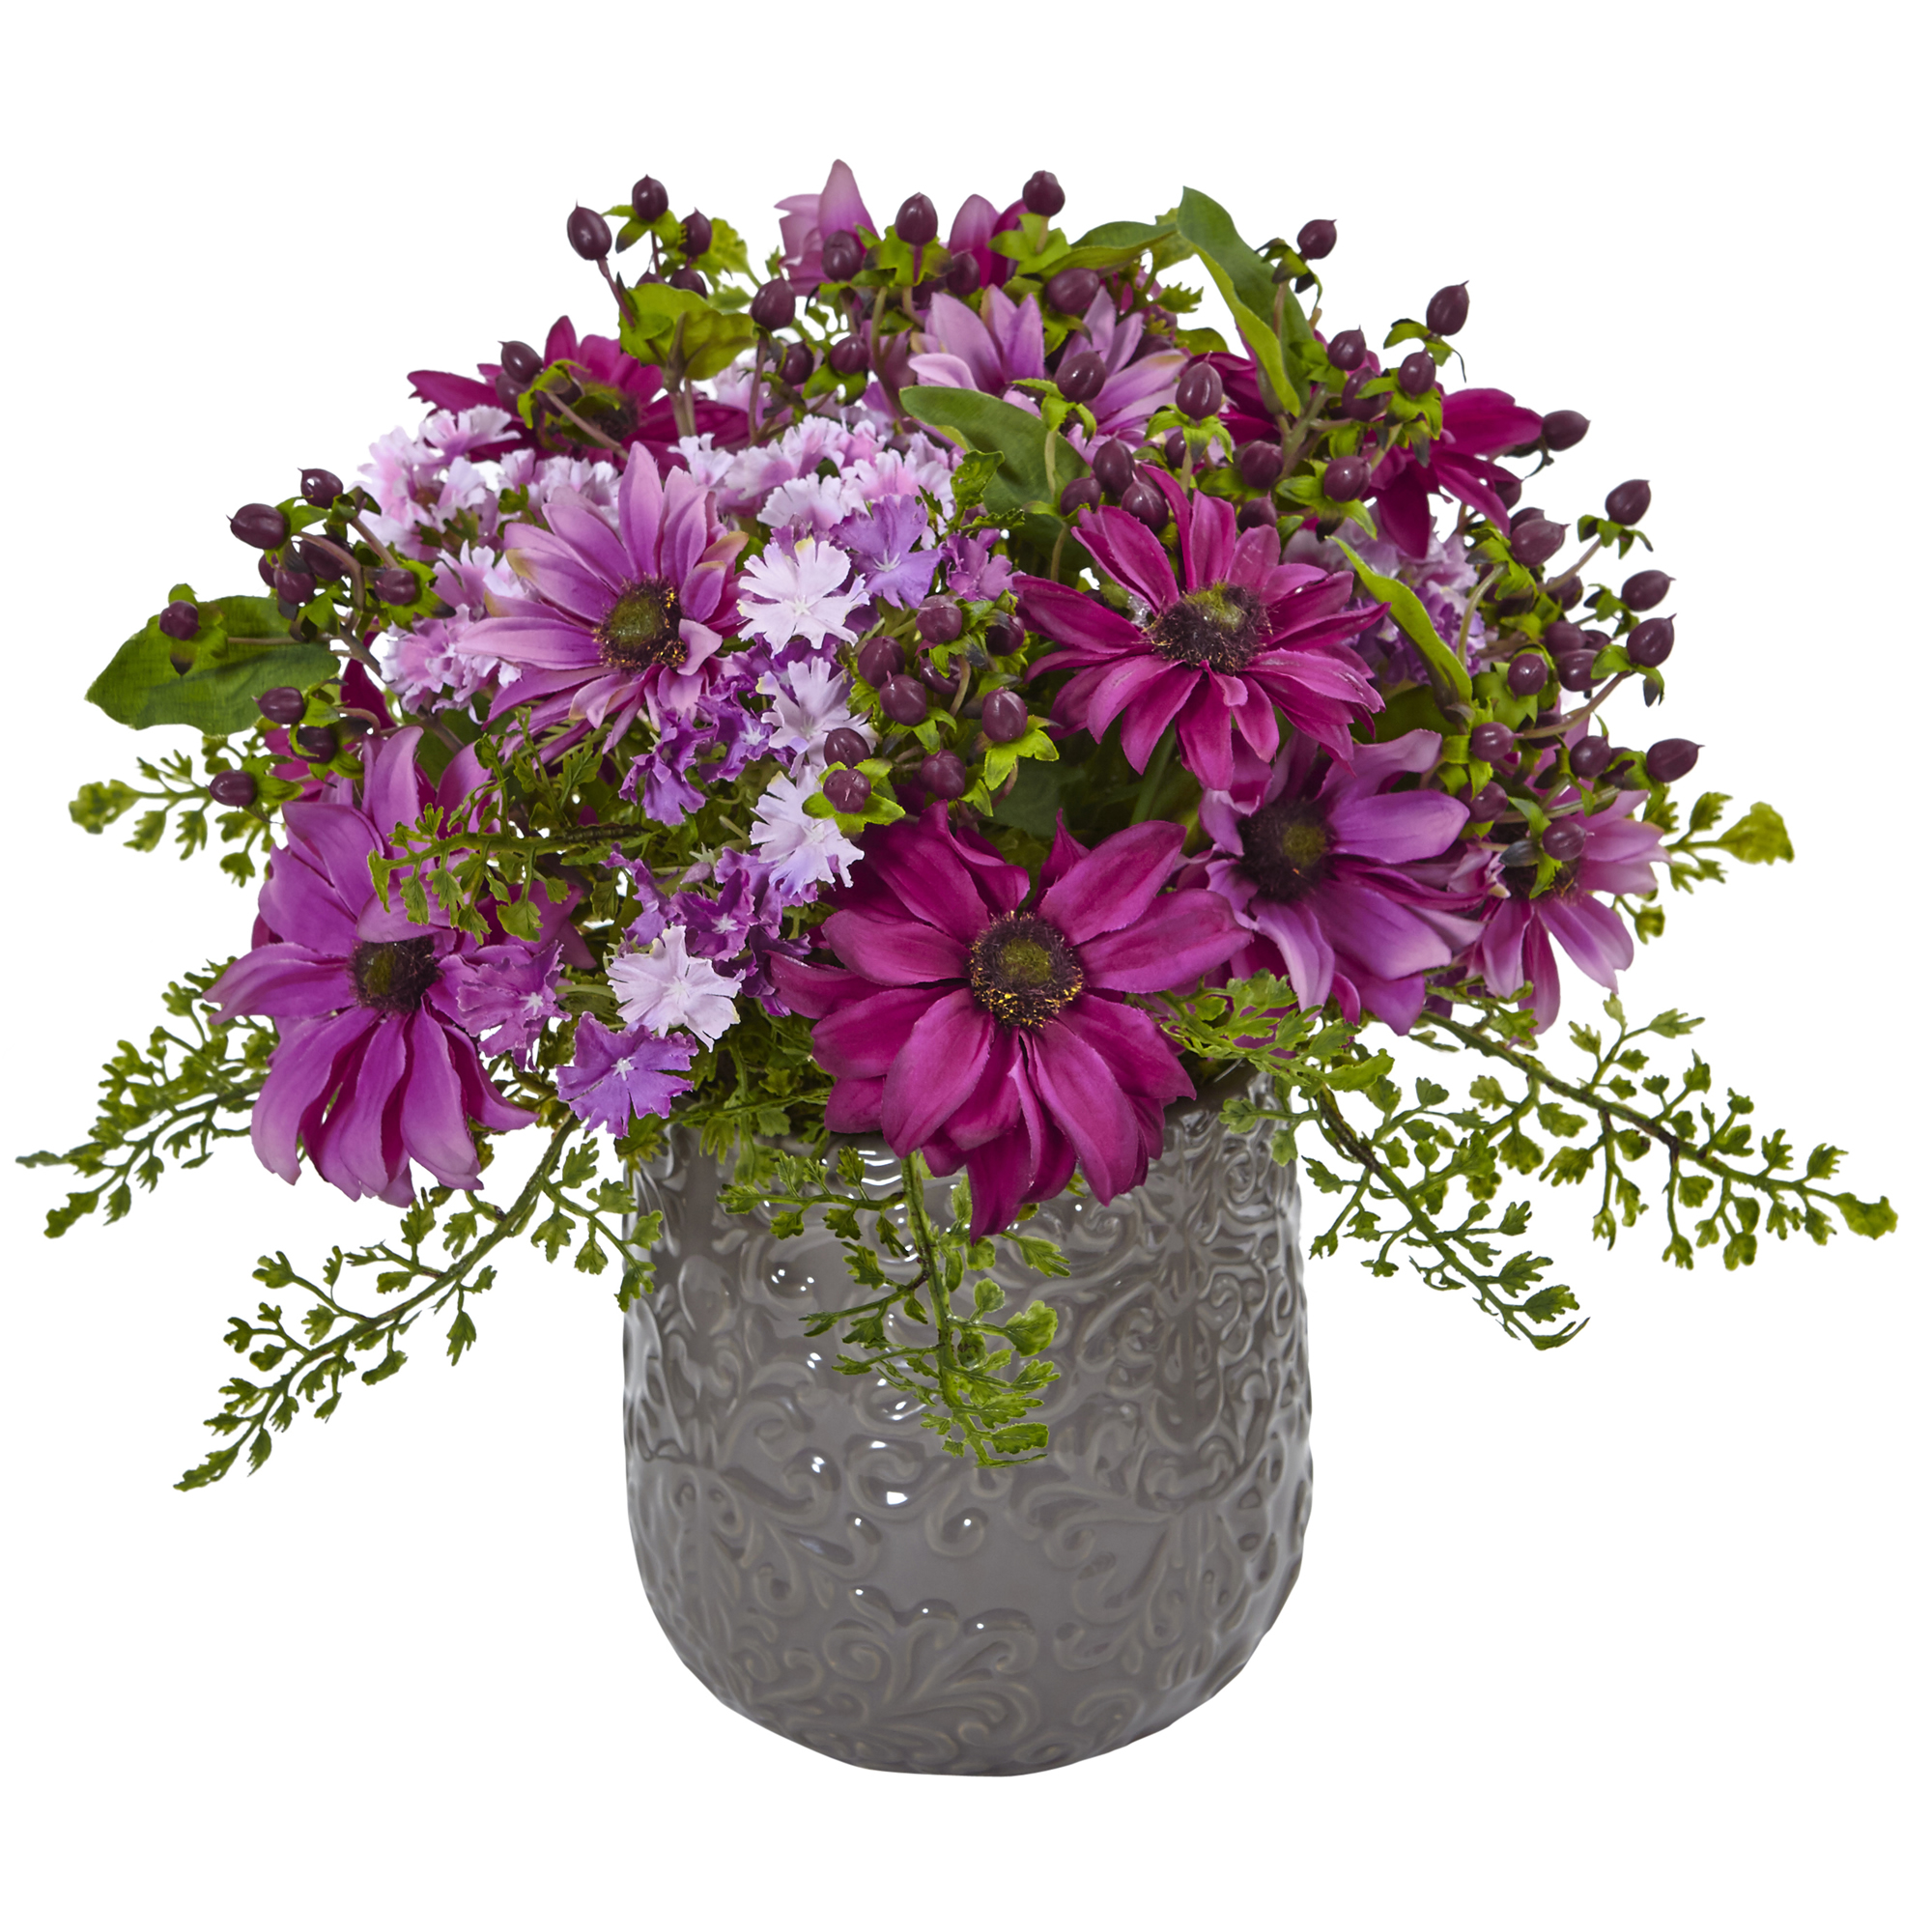 Artificial 13 Daisy Bush Flowers Floral Arrangement In Gray Ceramic